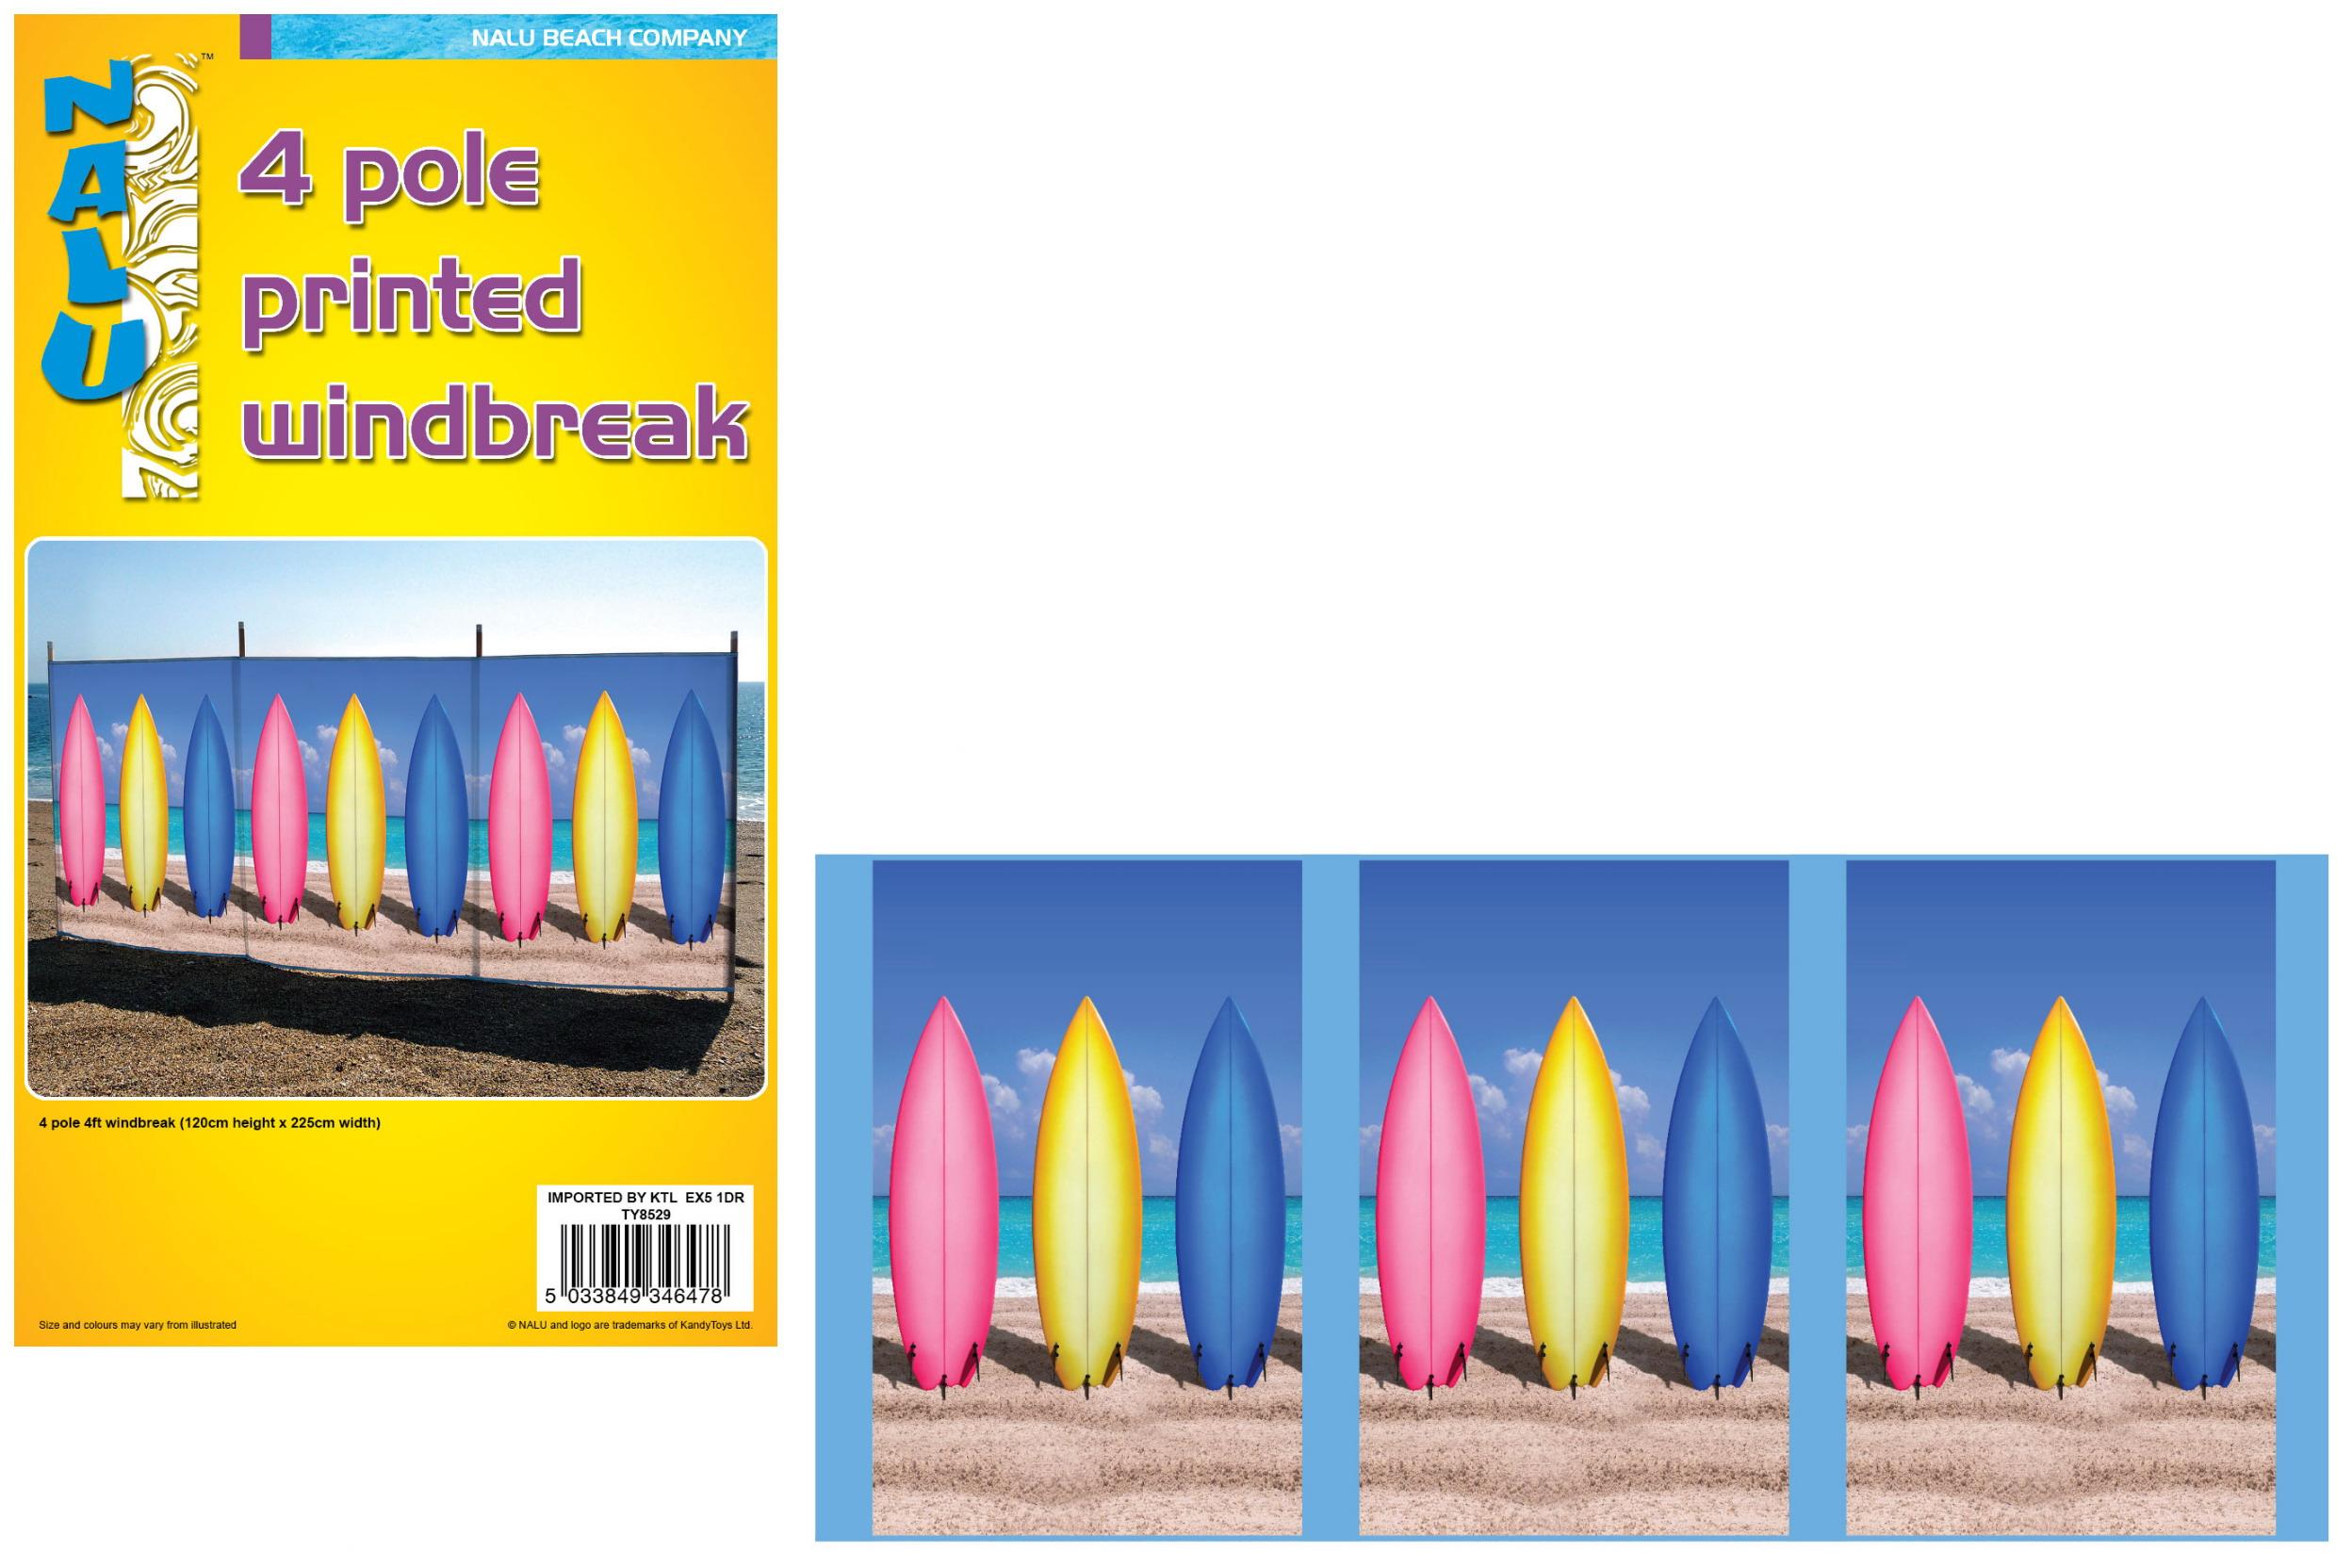 4 Pole 4' Printed Windbreak - Surf Boards Design